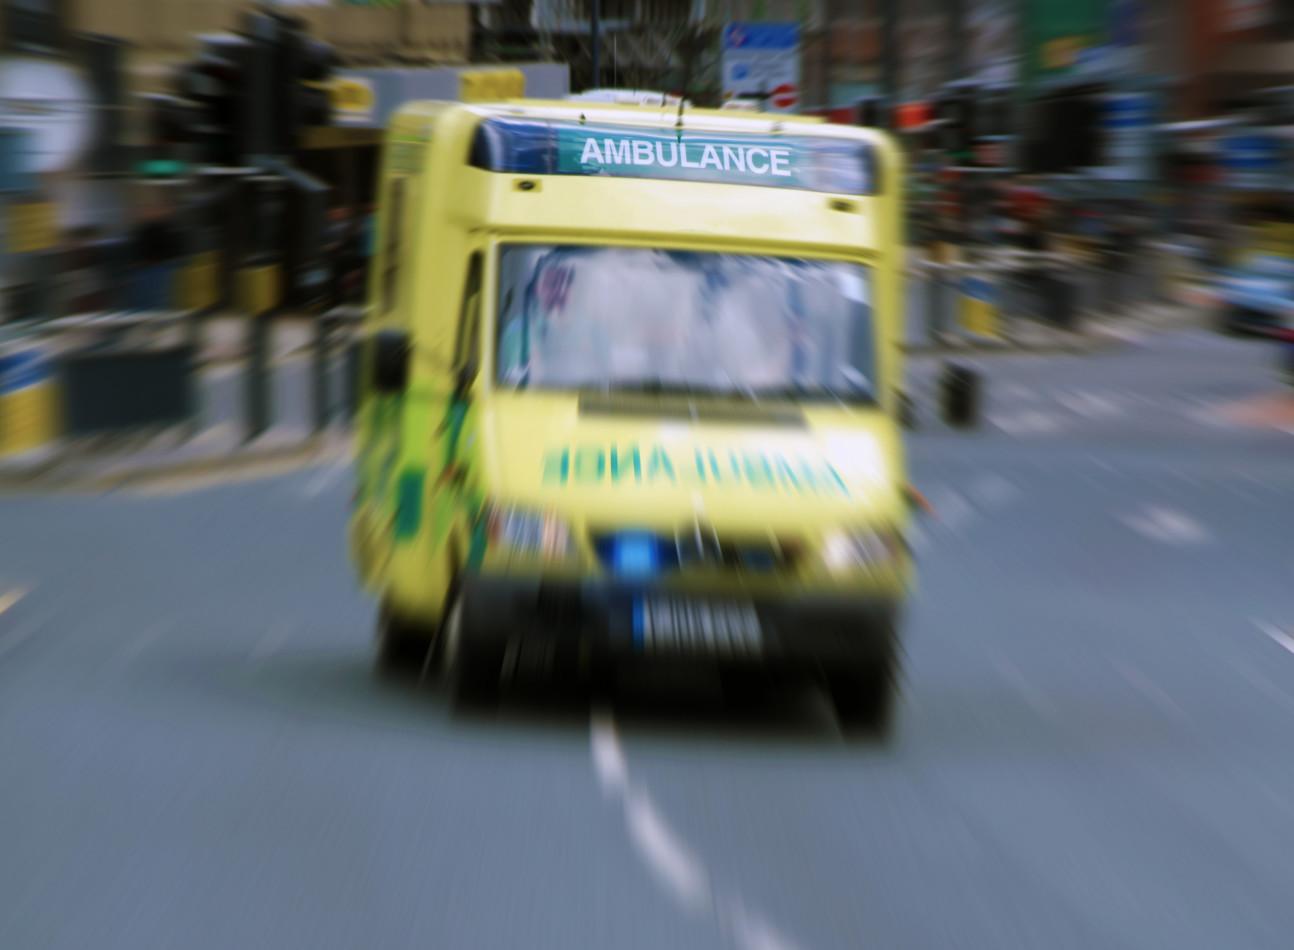 An ambulance speeding through a busy street